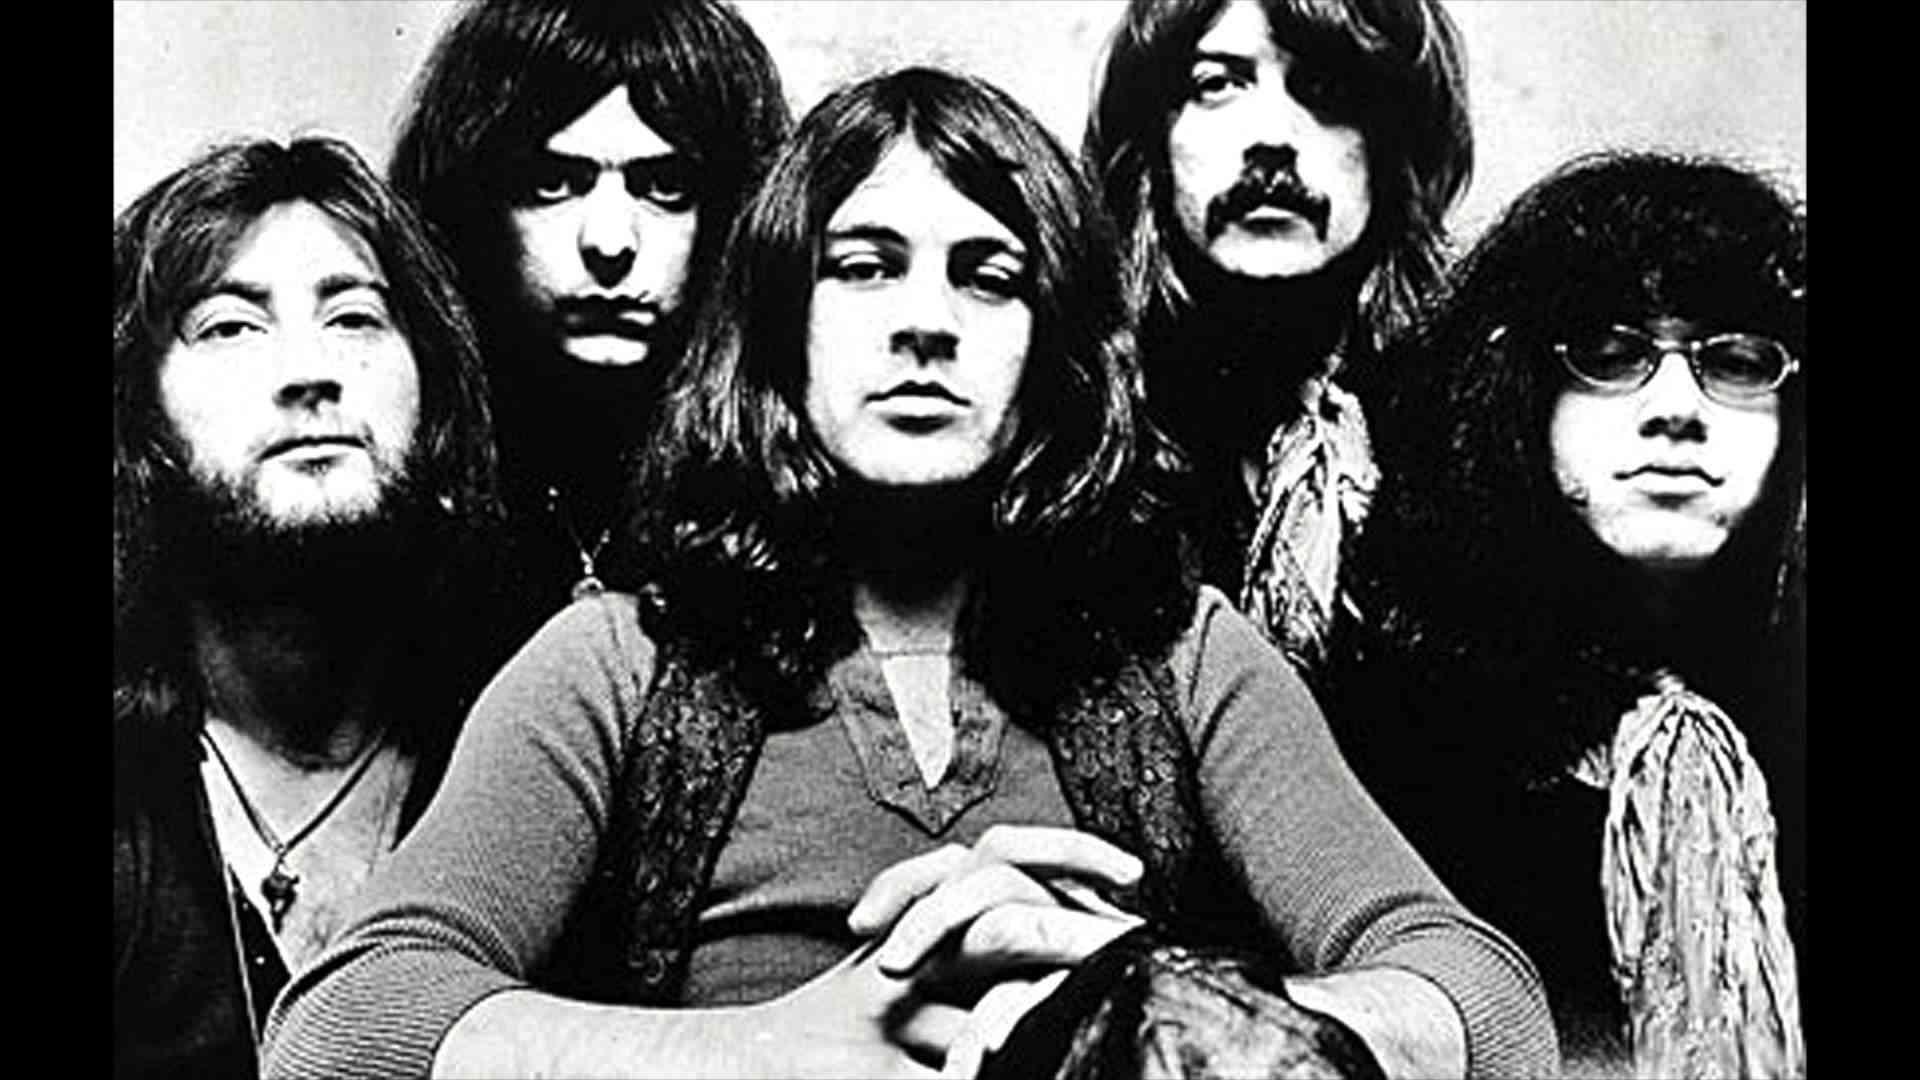 Deep Purple - Highway Star - YouTube